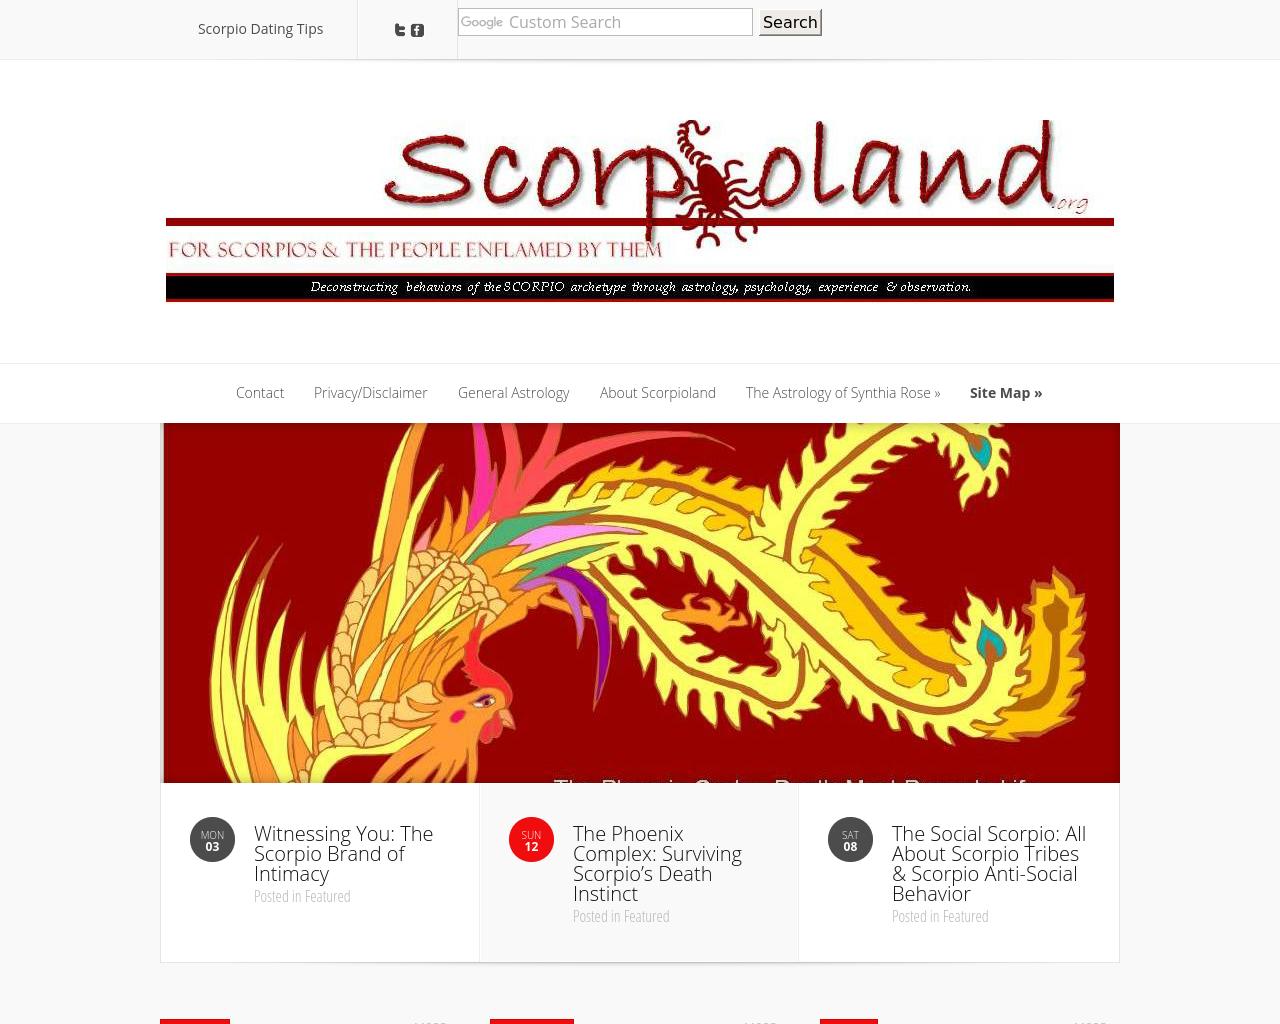 Scorpio-Land-Advertising-Reviews-Pricing